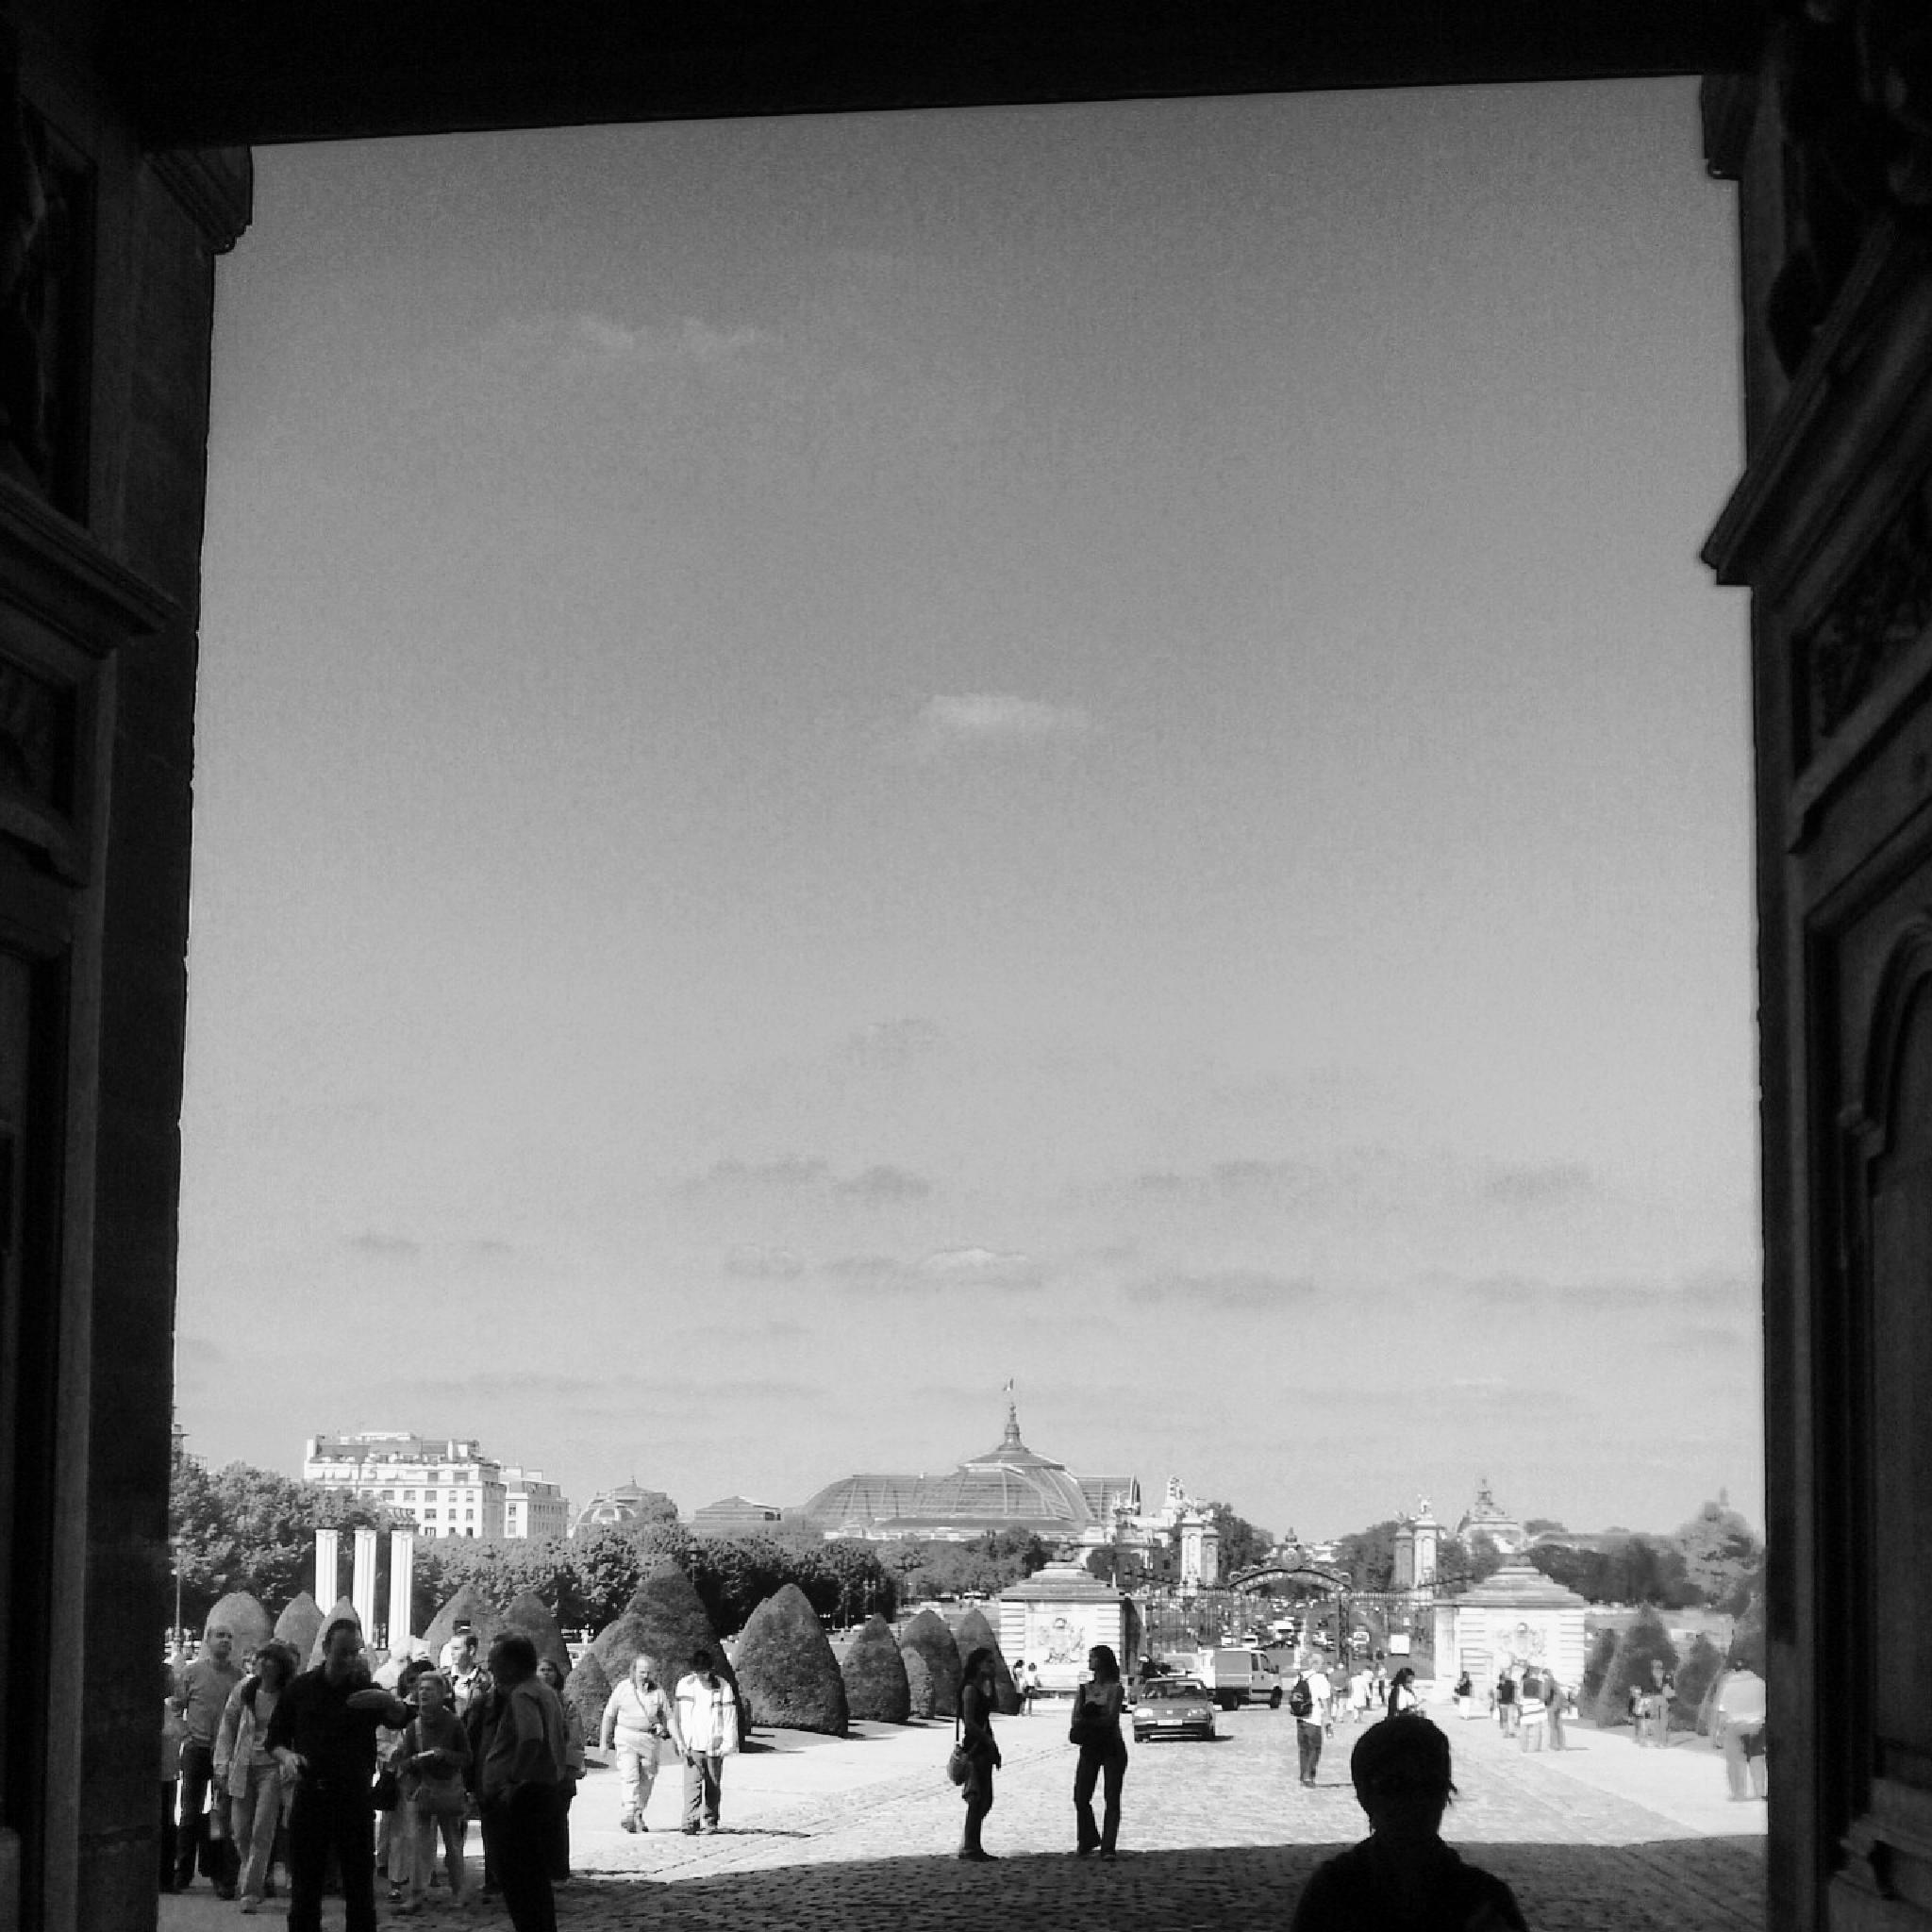 La porte du monde by marceloazevedo1972